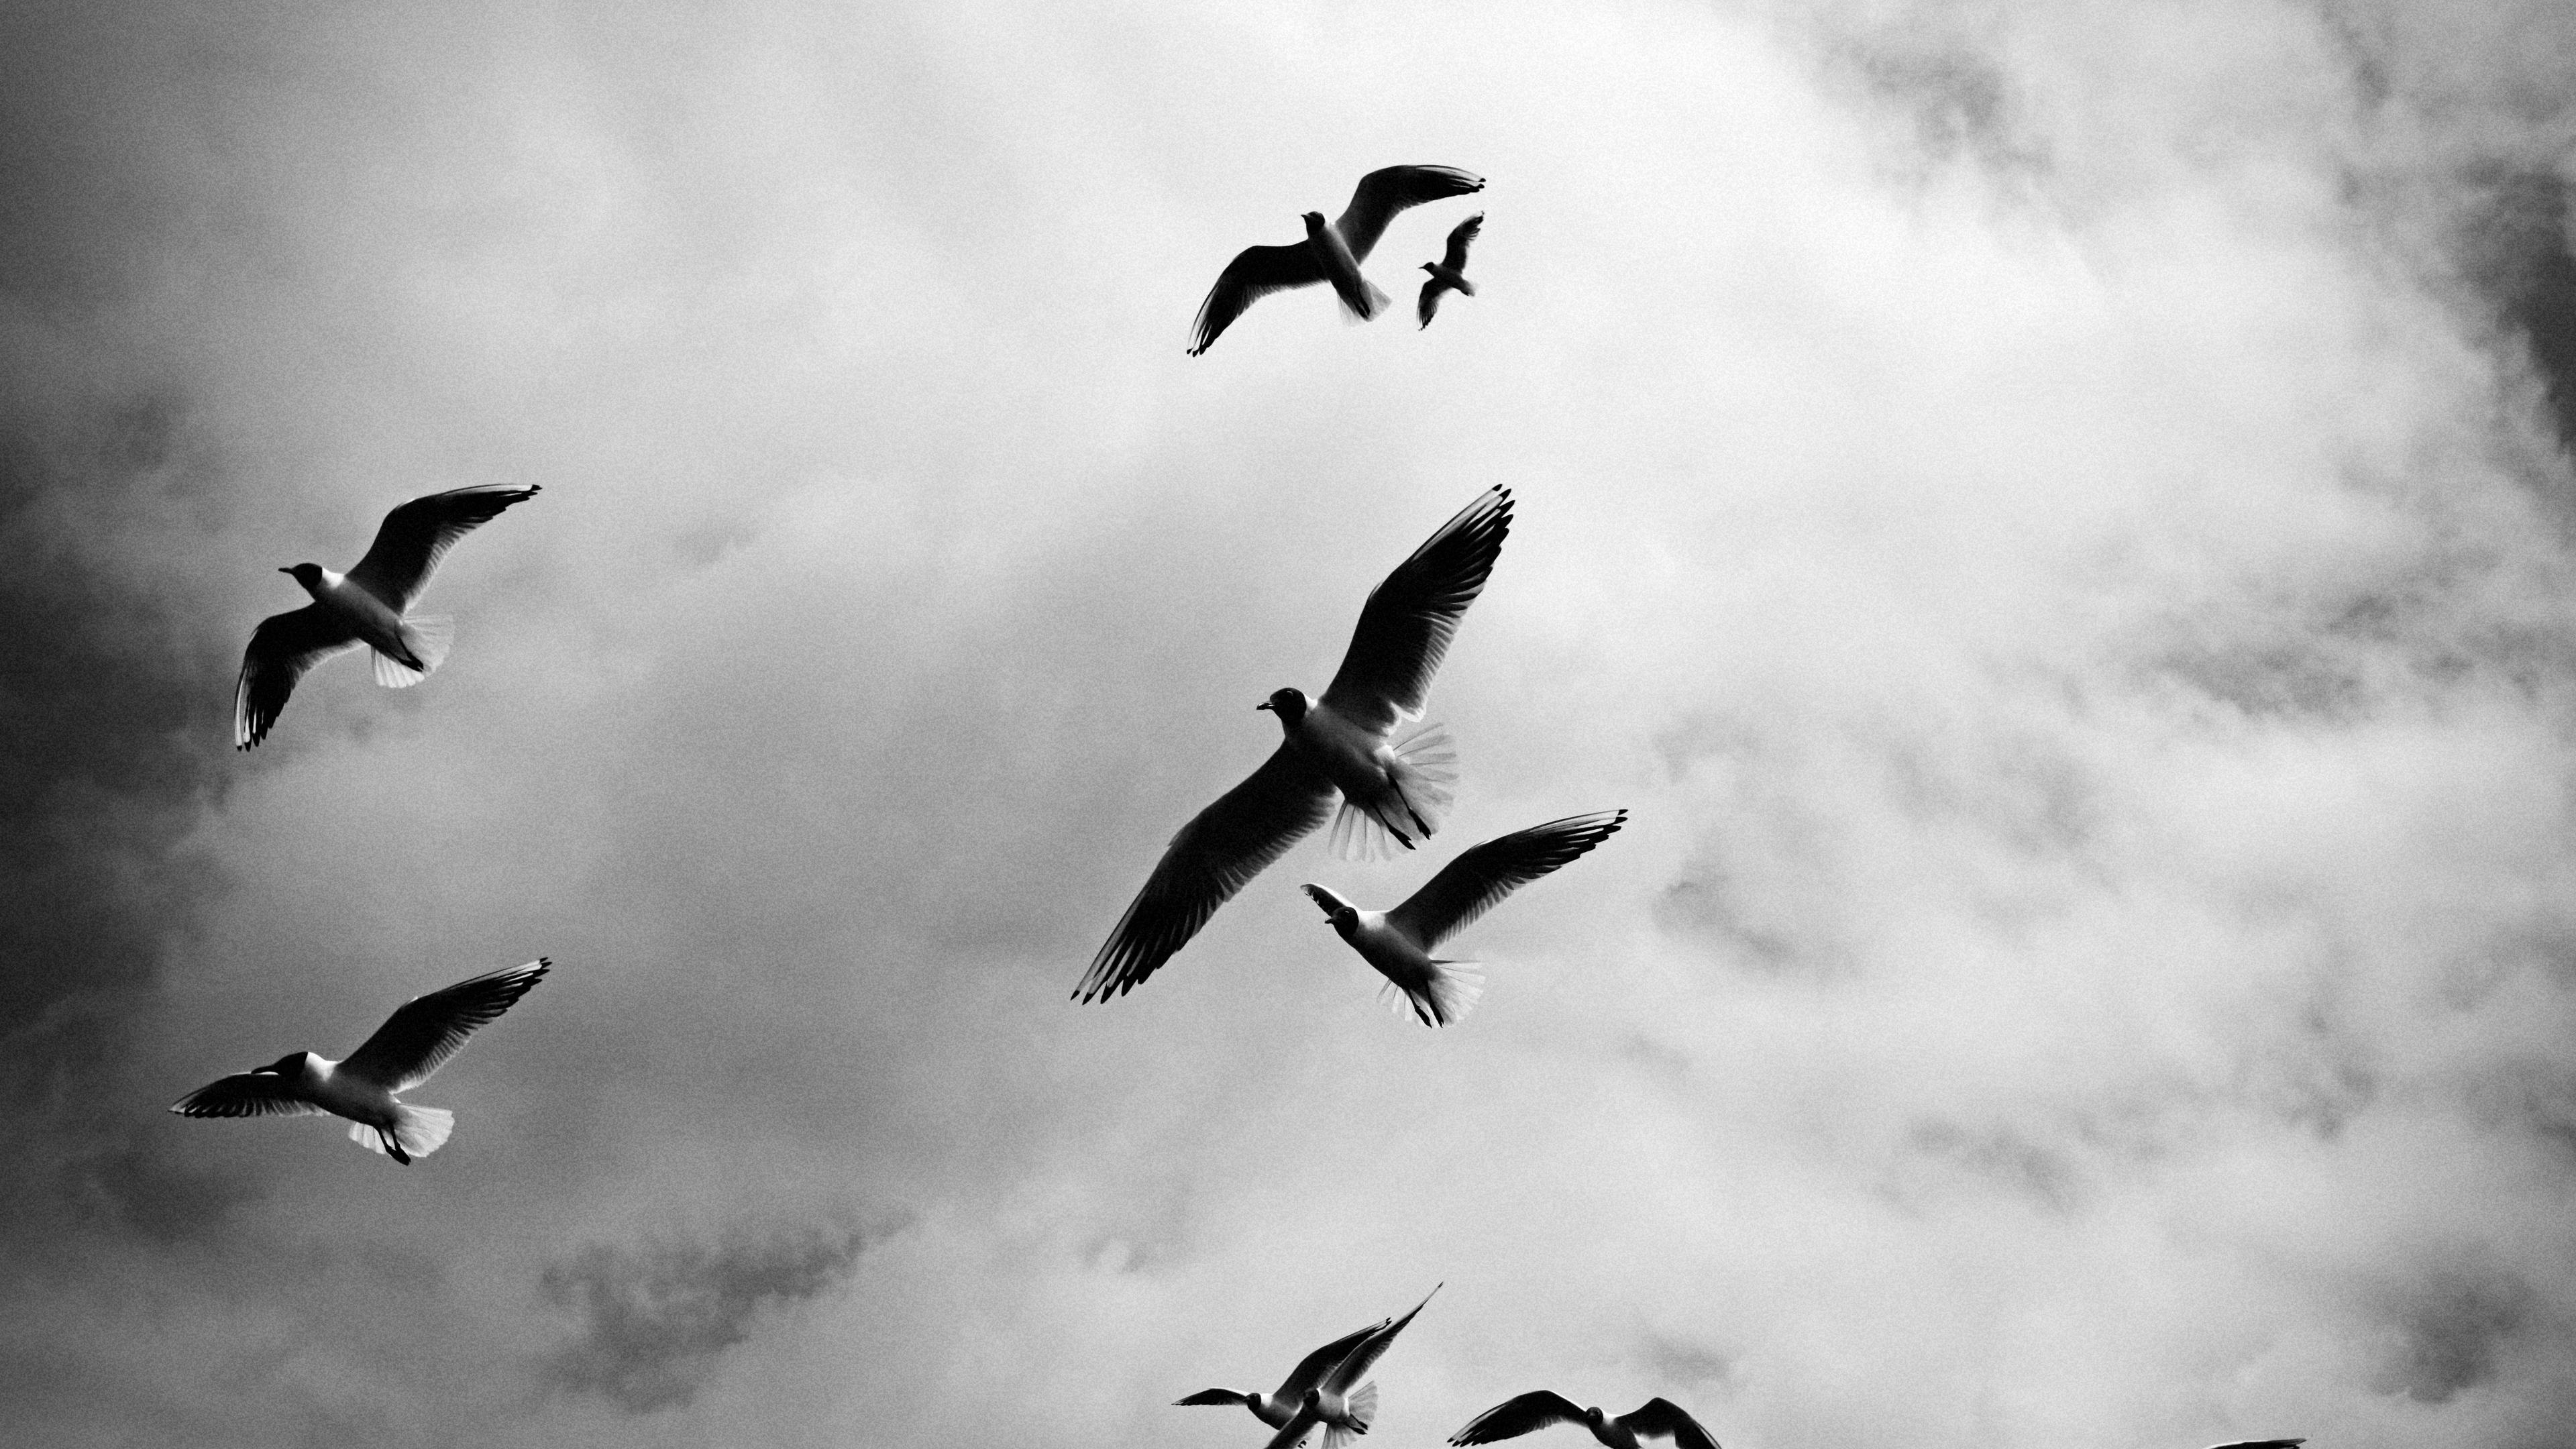 birds sky flight clouds bw 4k 1542242147 - birds, sky, flight, clouds, bw 4k - Sky, Flight, Birds